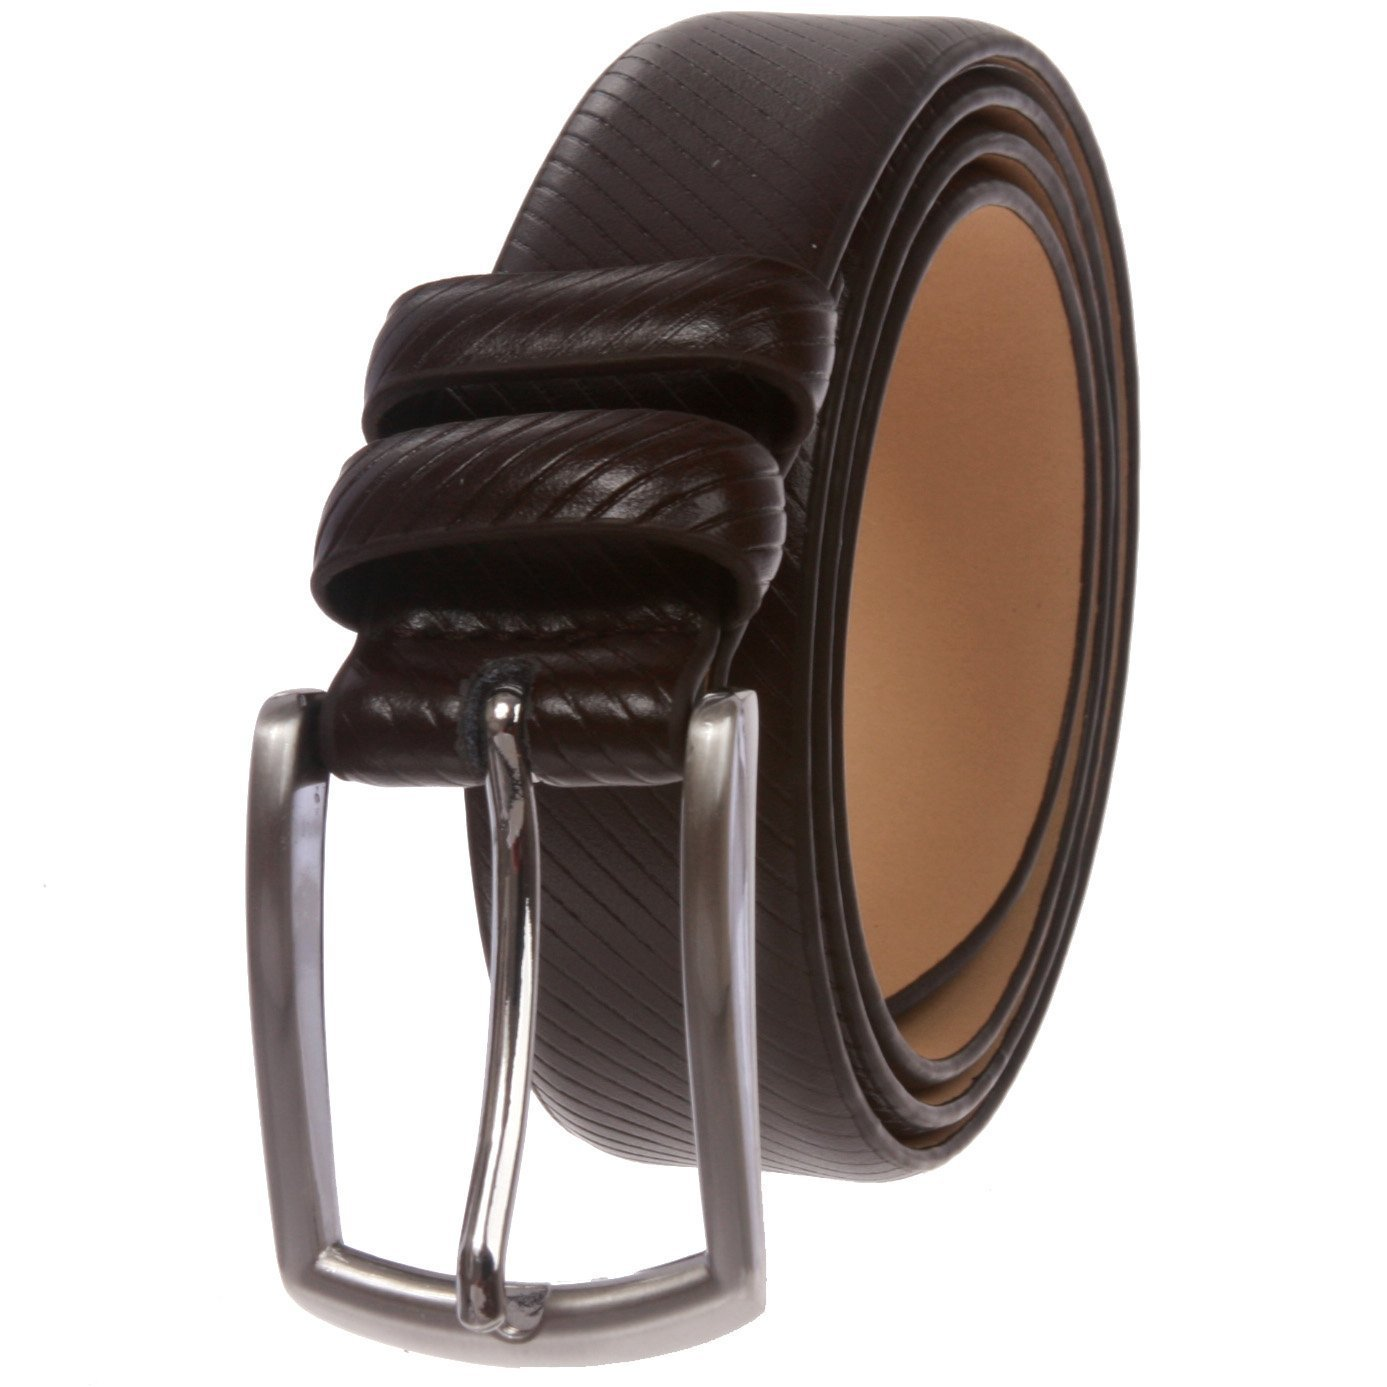 MONIQUE Men Feather Edged Leather Silver Finish Rectangular Buckle 30mm Belt